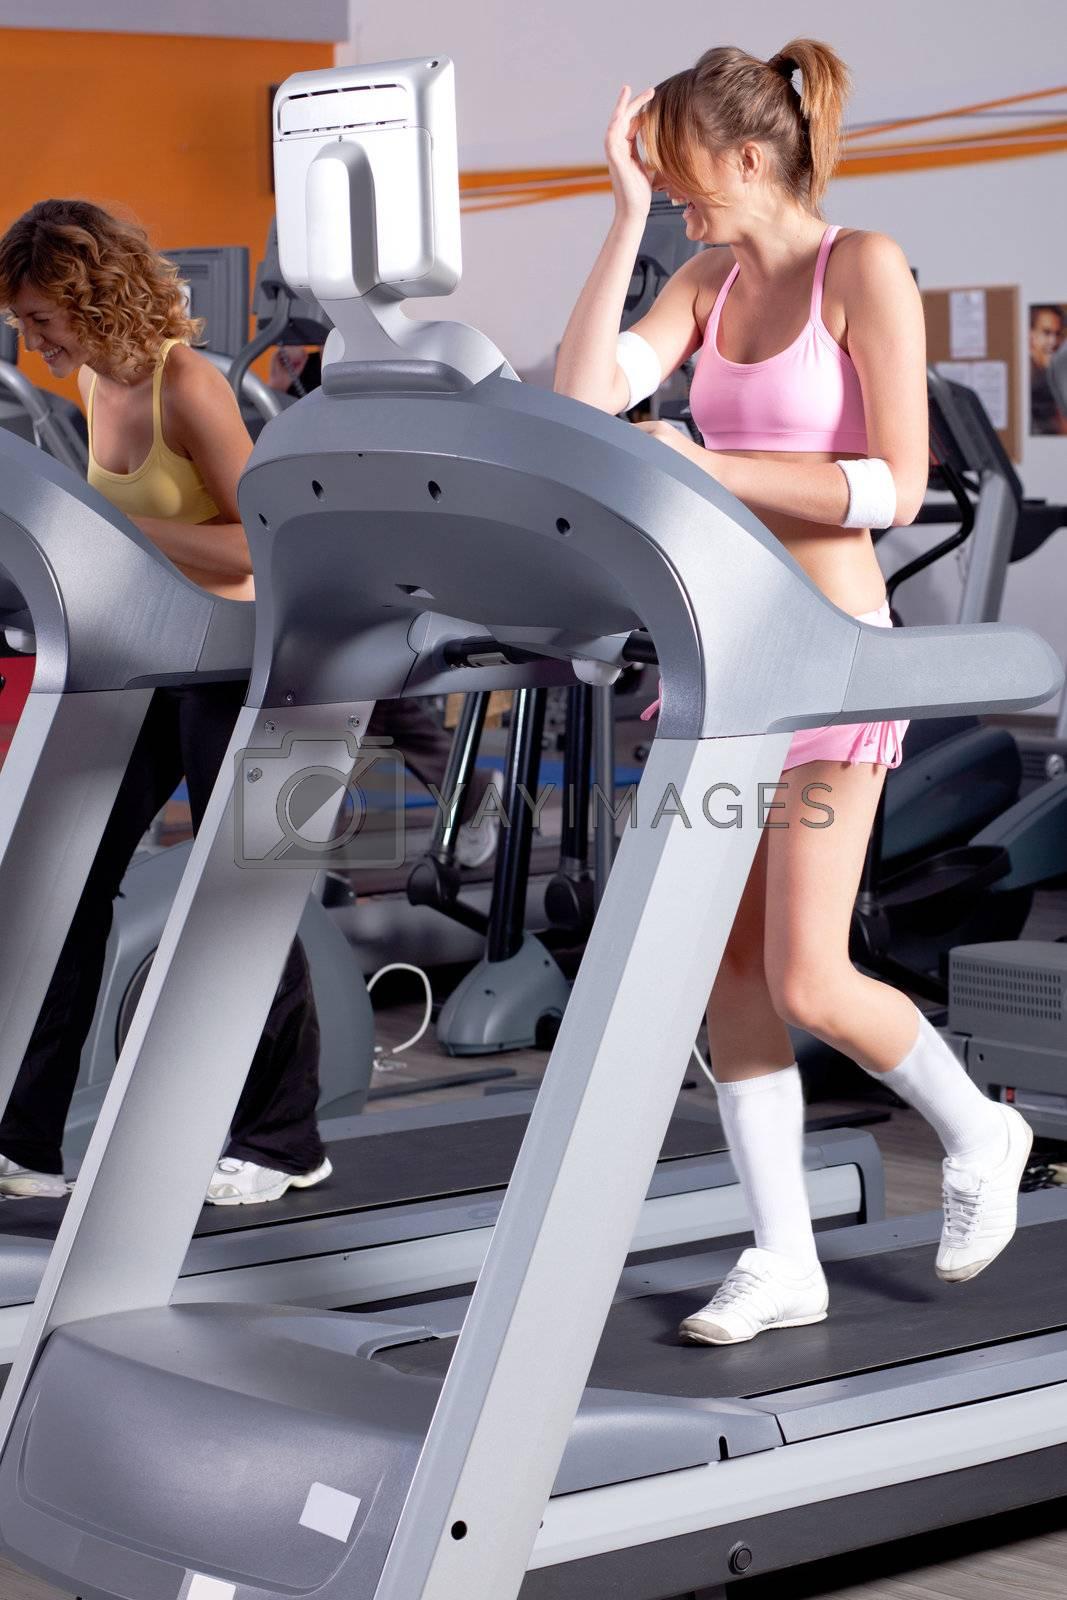 Woman on running machine in gym by get4net